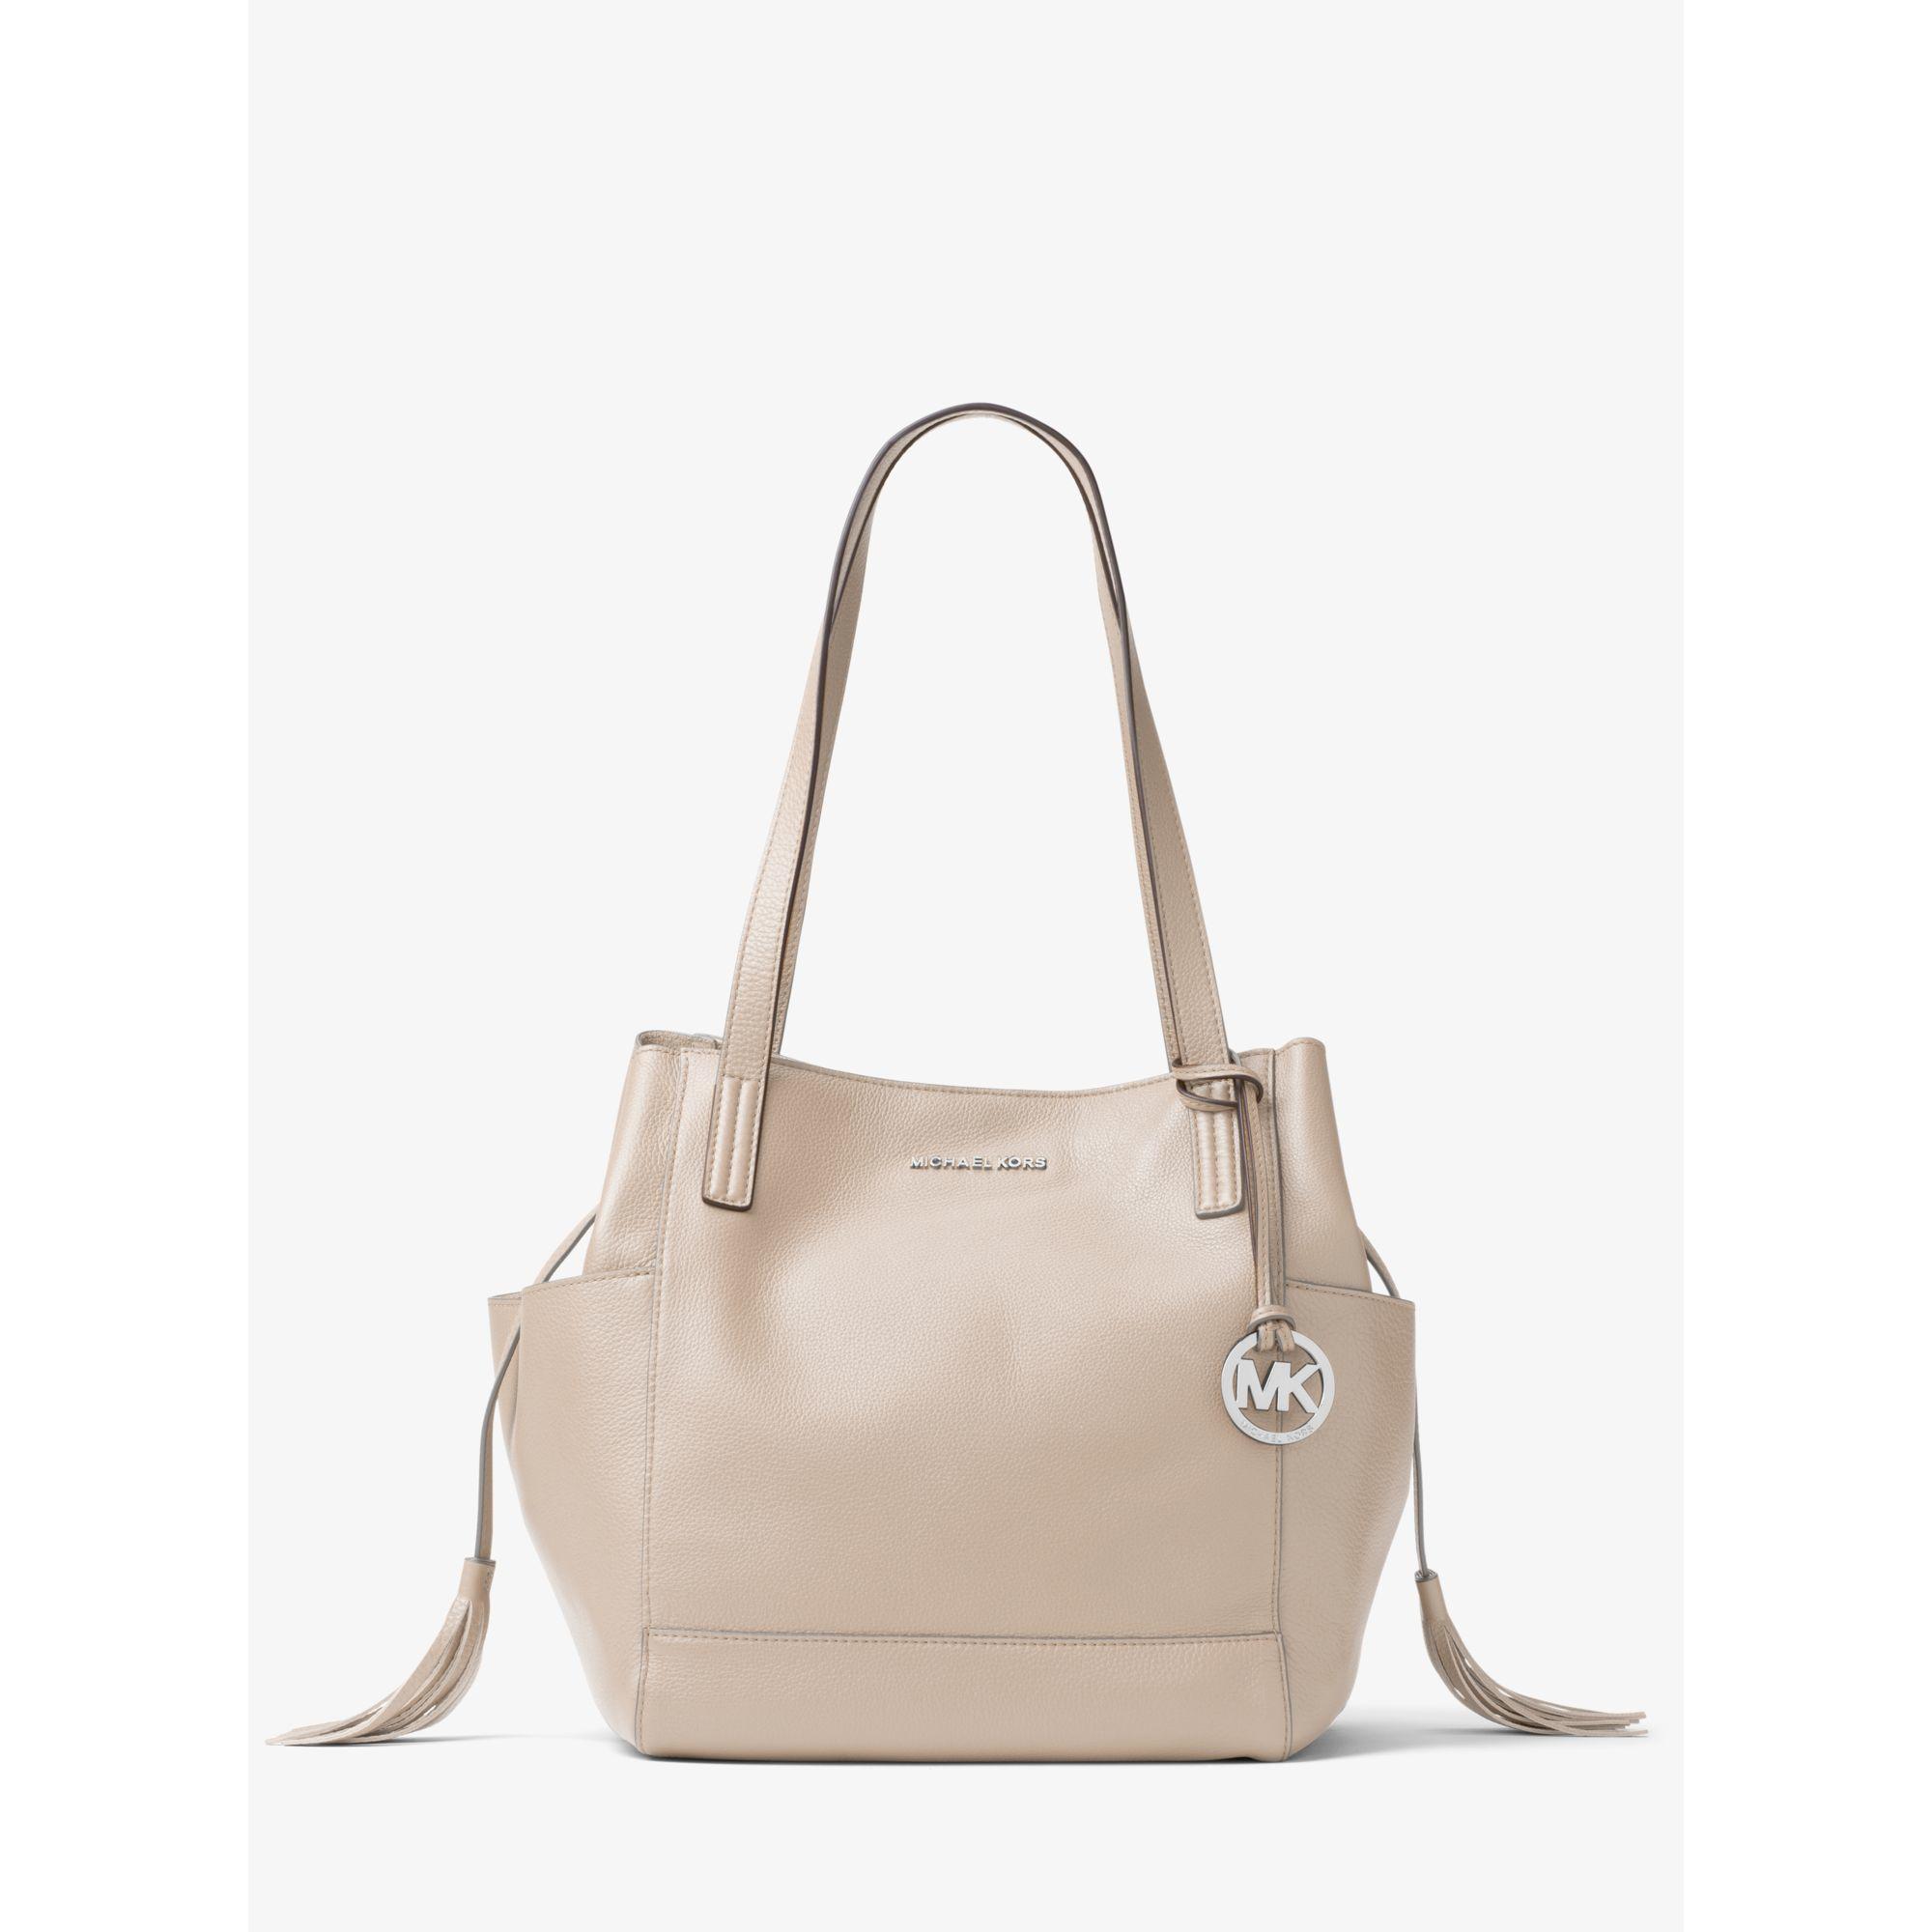 532c5c04e3ae Lyst - Michael Kors Ashbury Large Leather Shoulder Bag